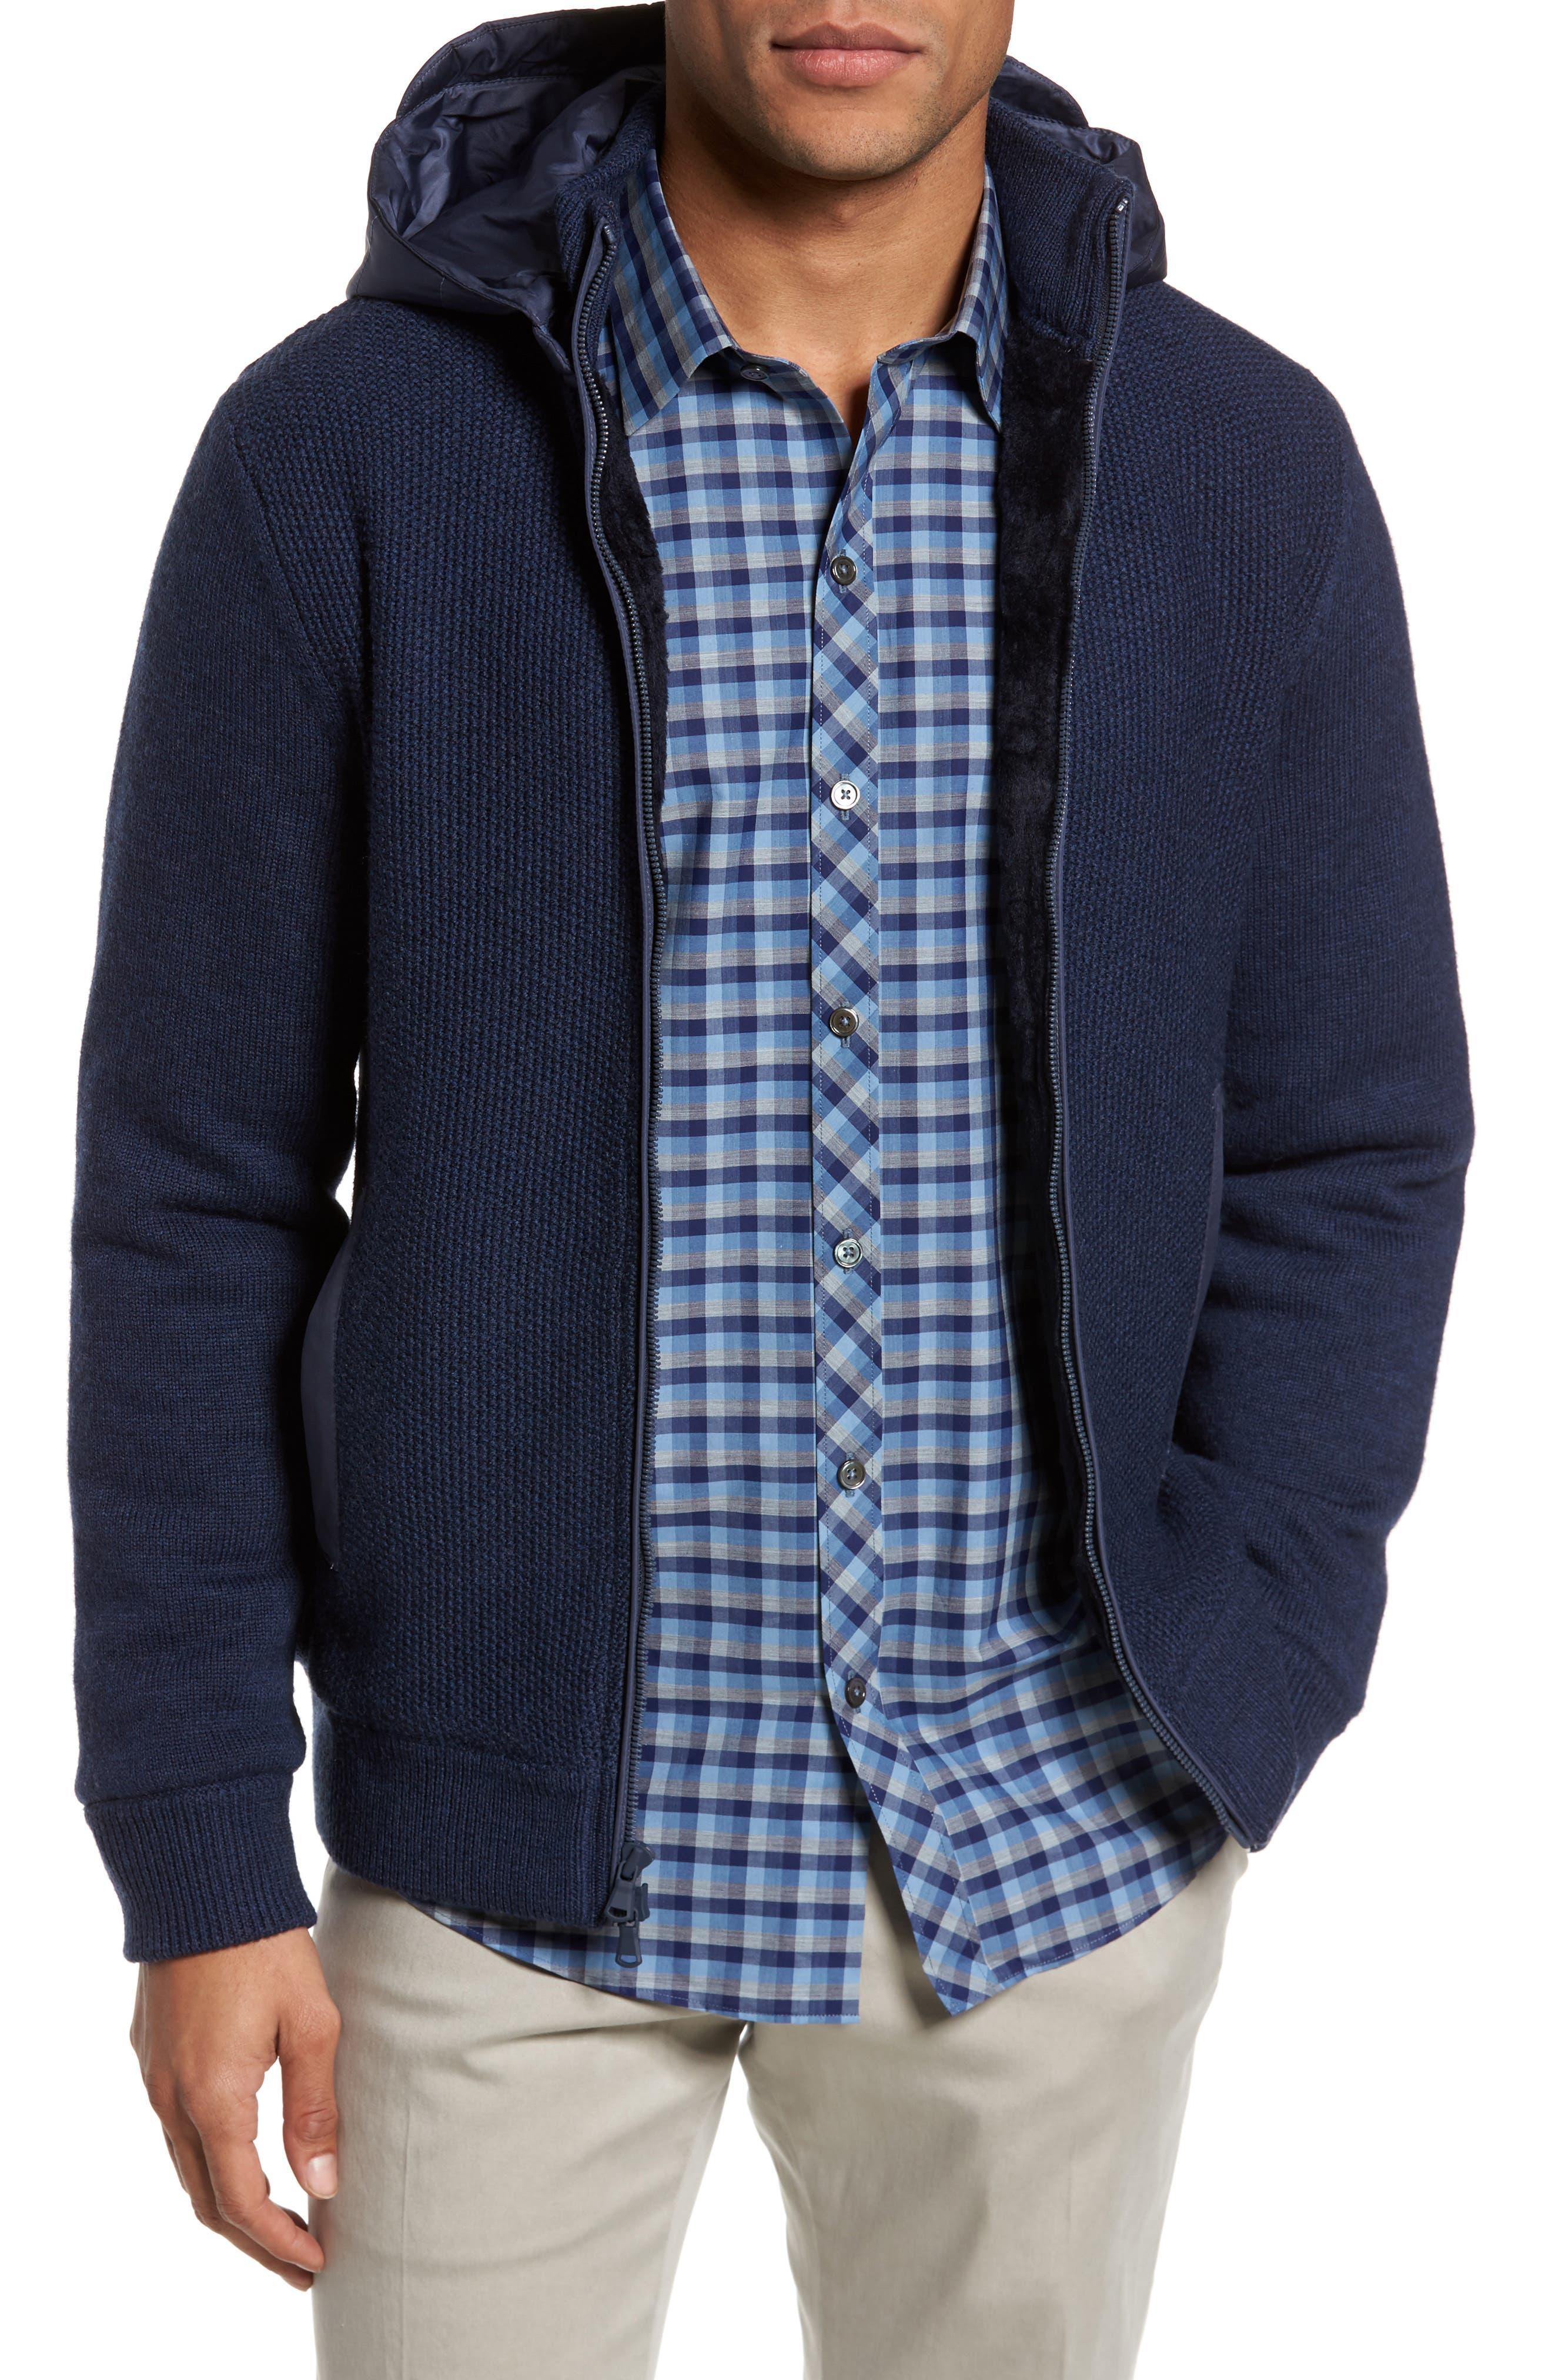 Haydon Merino Wool Sweater Jacket,                         Main,                         color, Navy